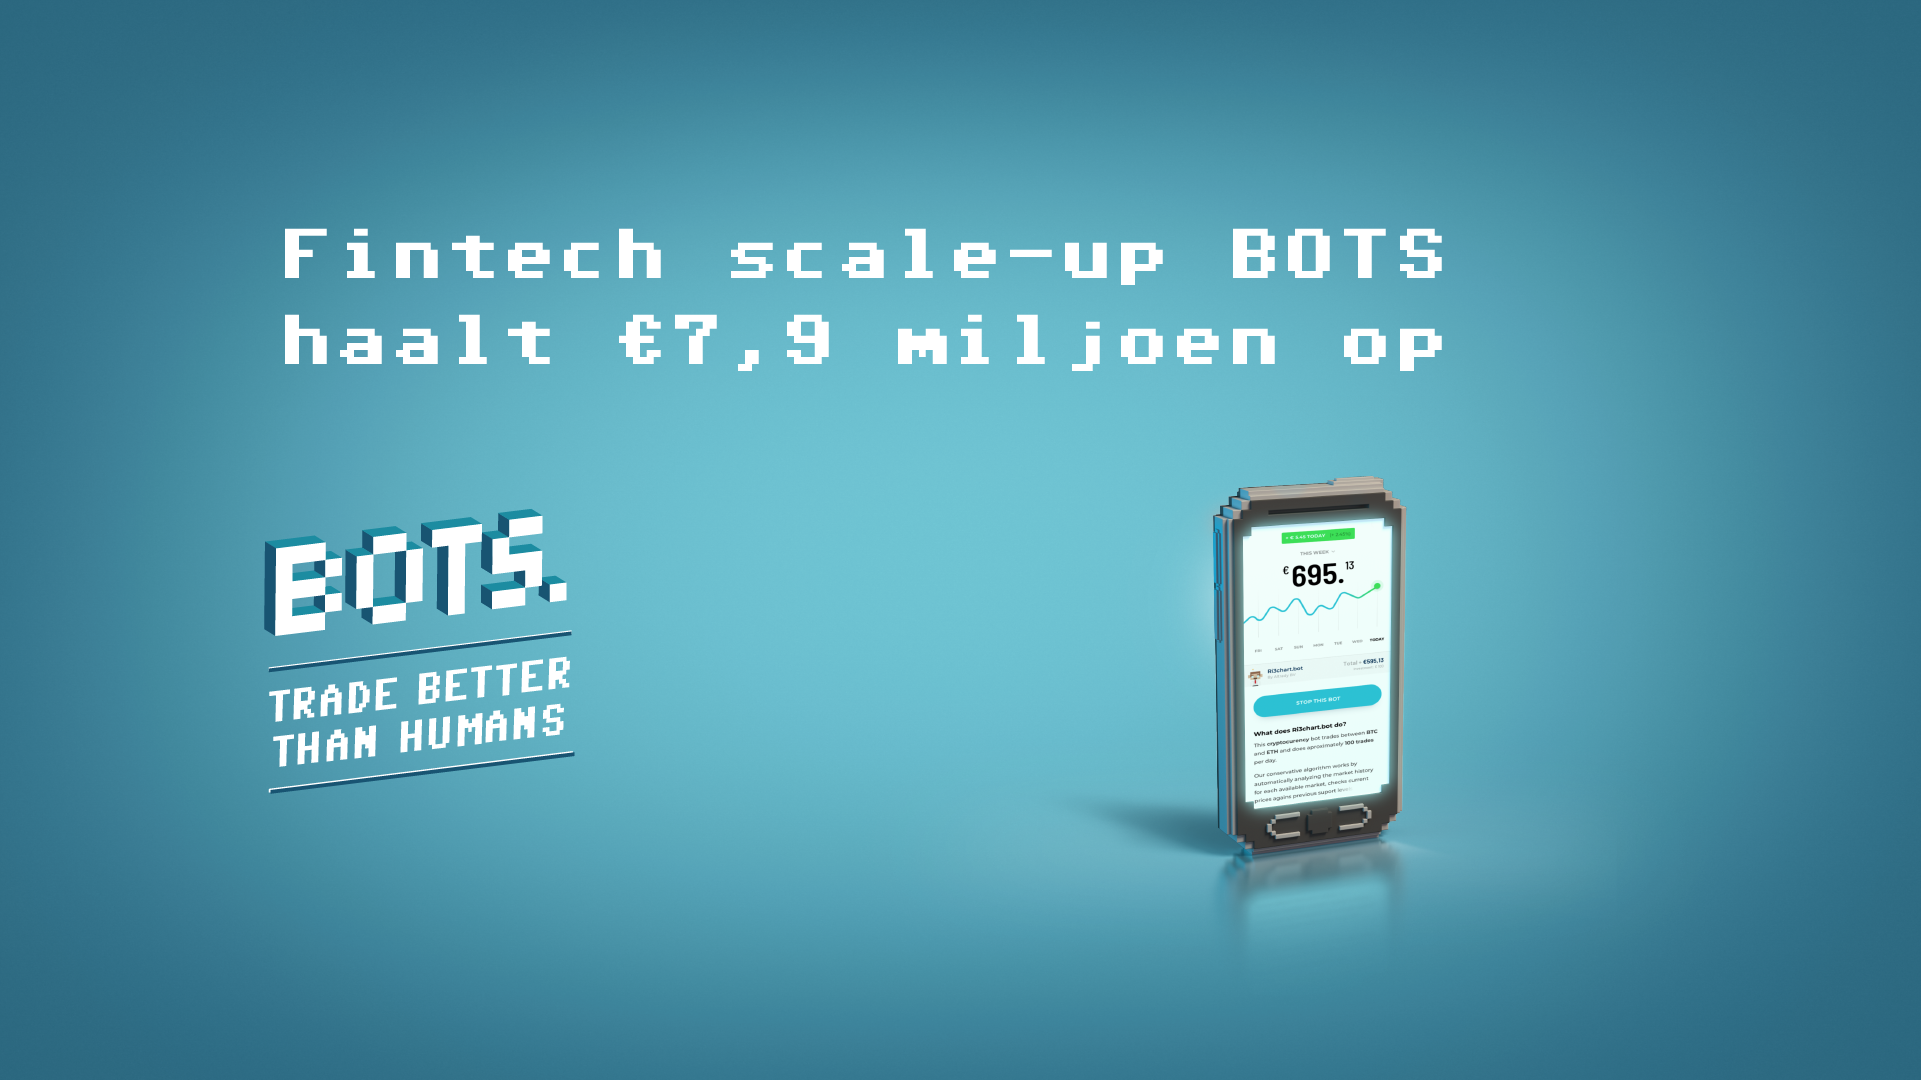 Fintech augmente sa production de BOTS de 7,9 millions d'euros